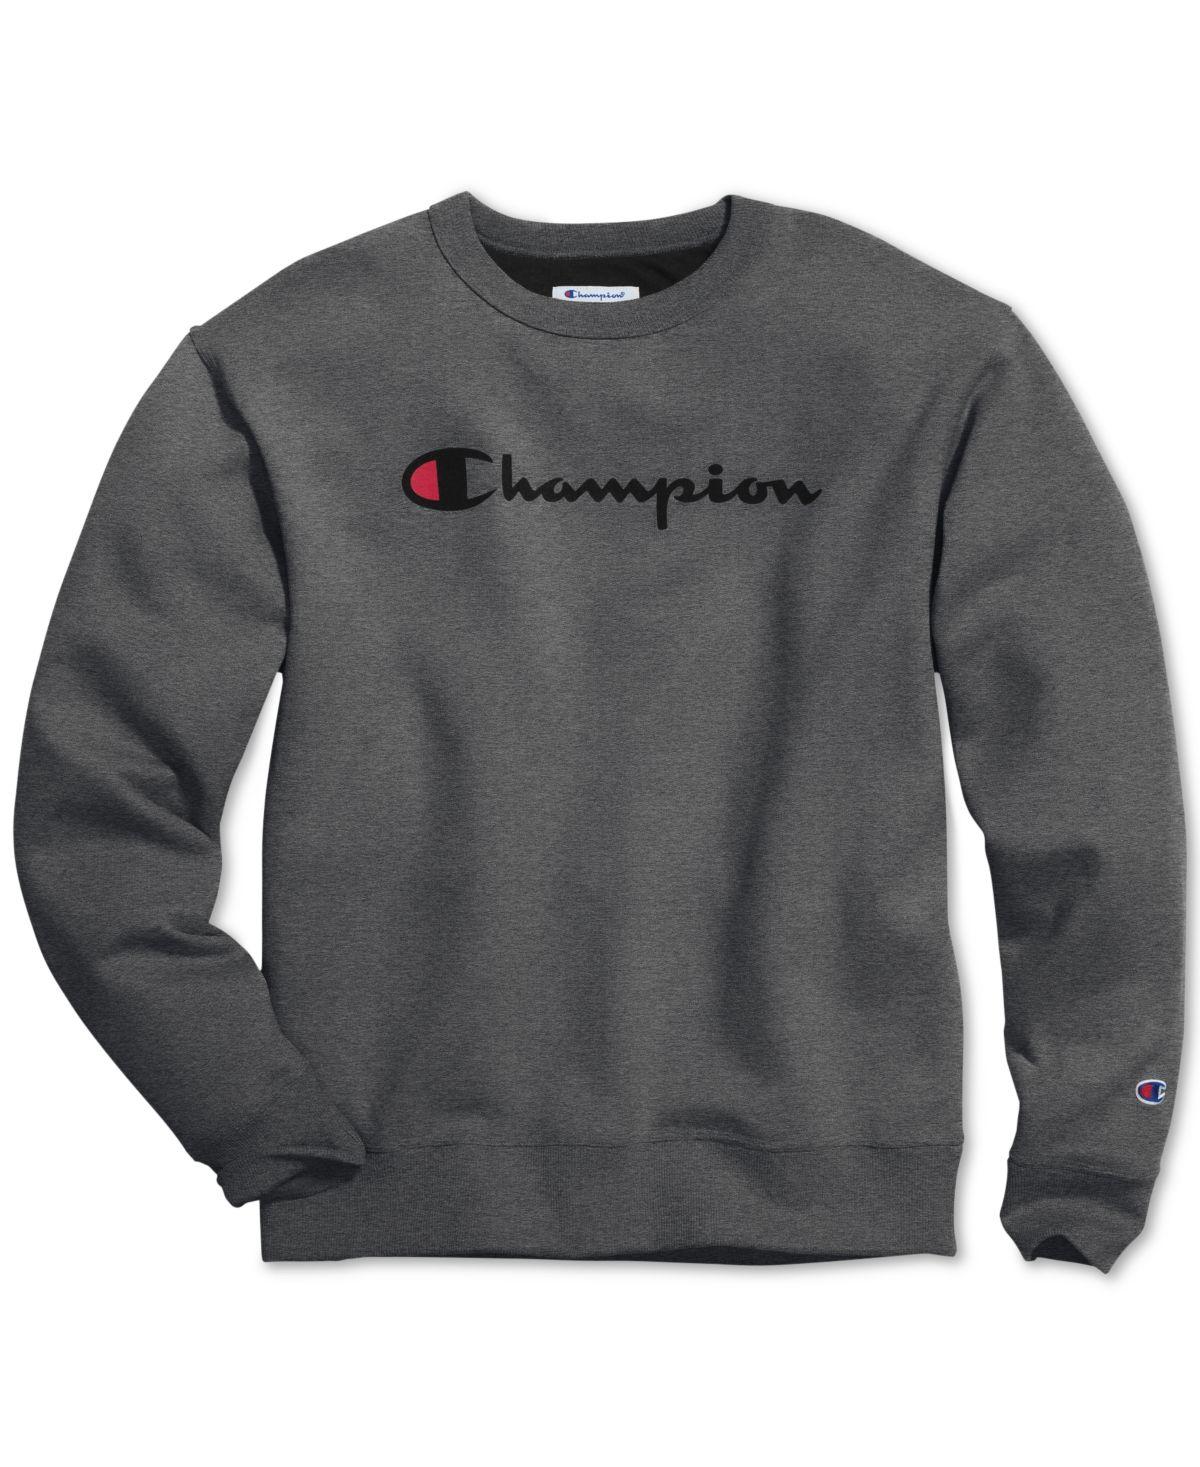 Champion Men S Powerblend Fleece Logo Sweatshirt Granite In 2020 Mens Sweatshirts Sweatshirts Champion Clothing [ 1467 x 1200 Pixel ]